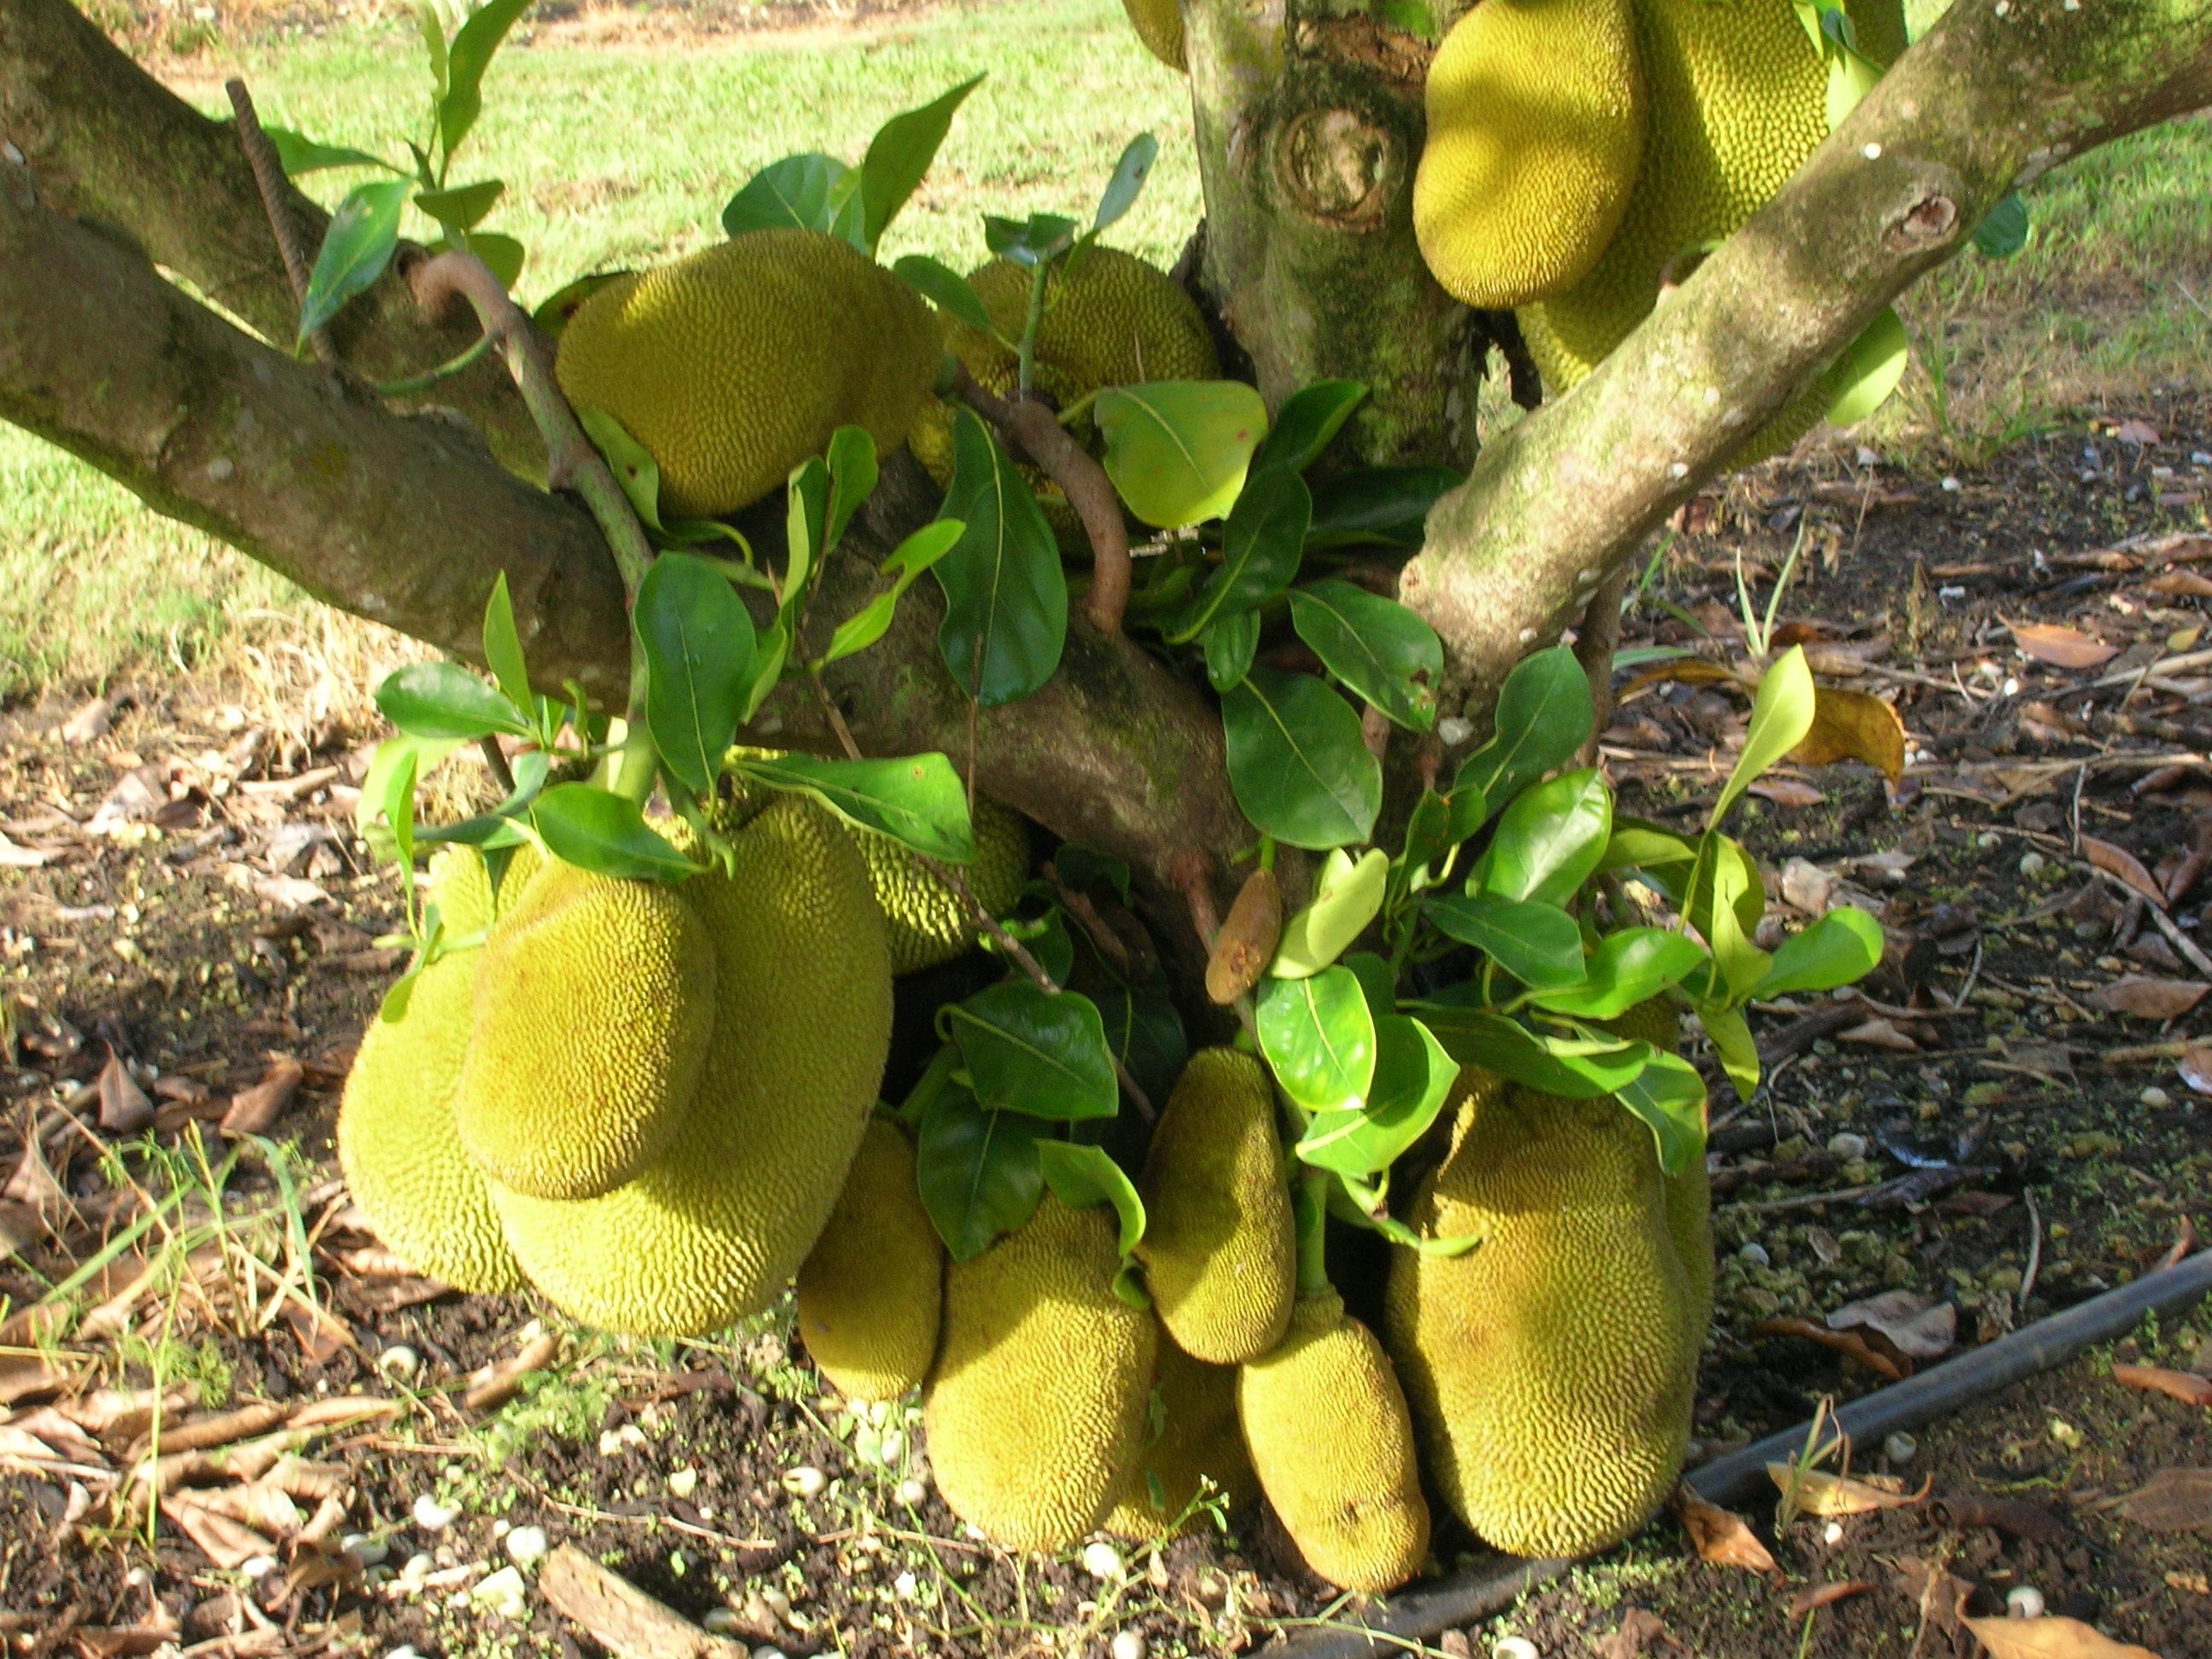 Artocarpus-heterophyllus-Jackfruit1.jpg